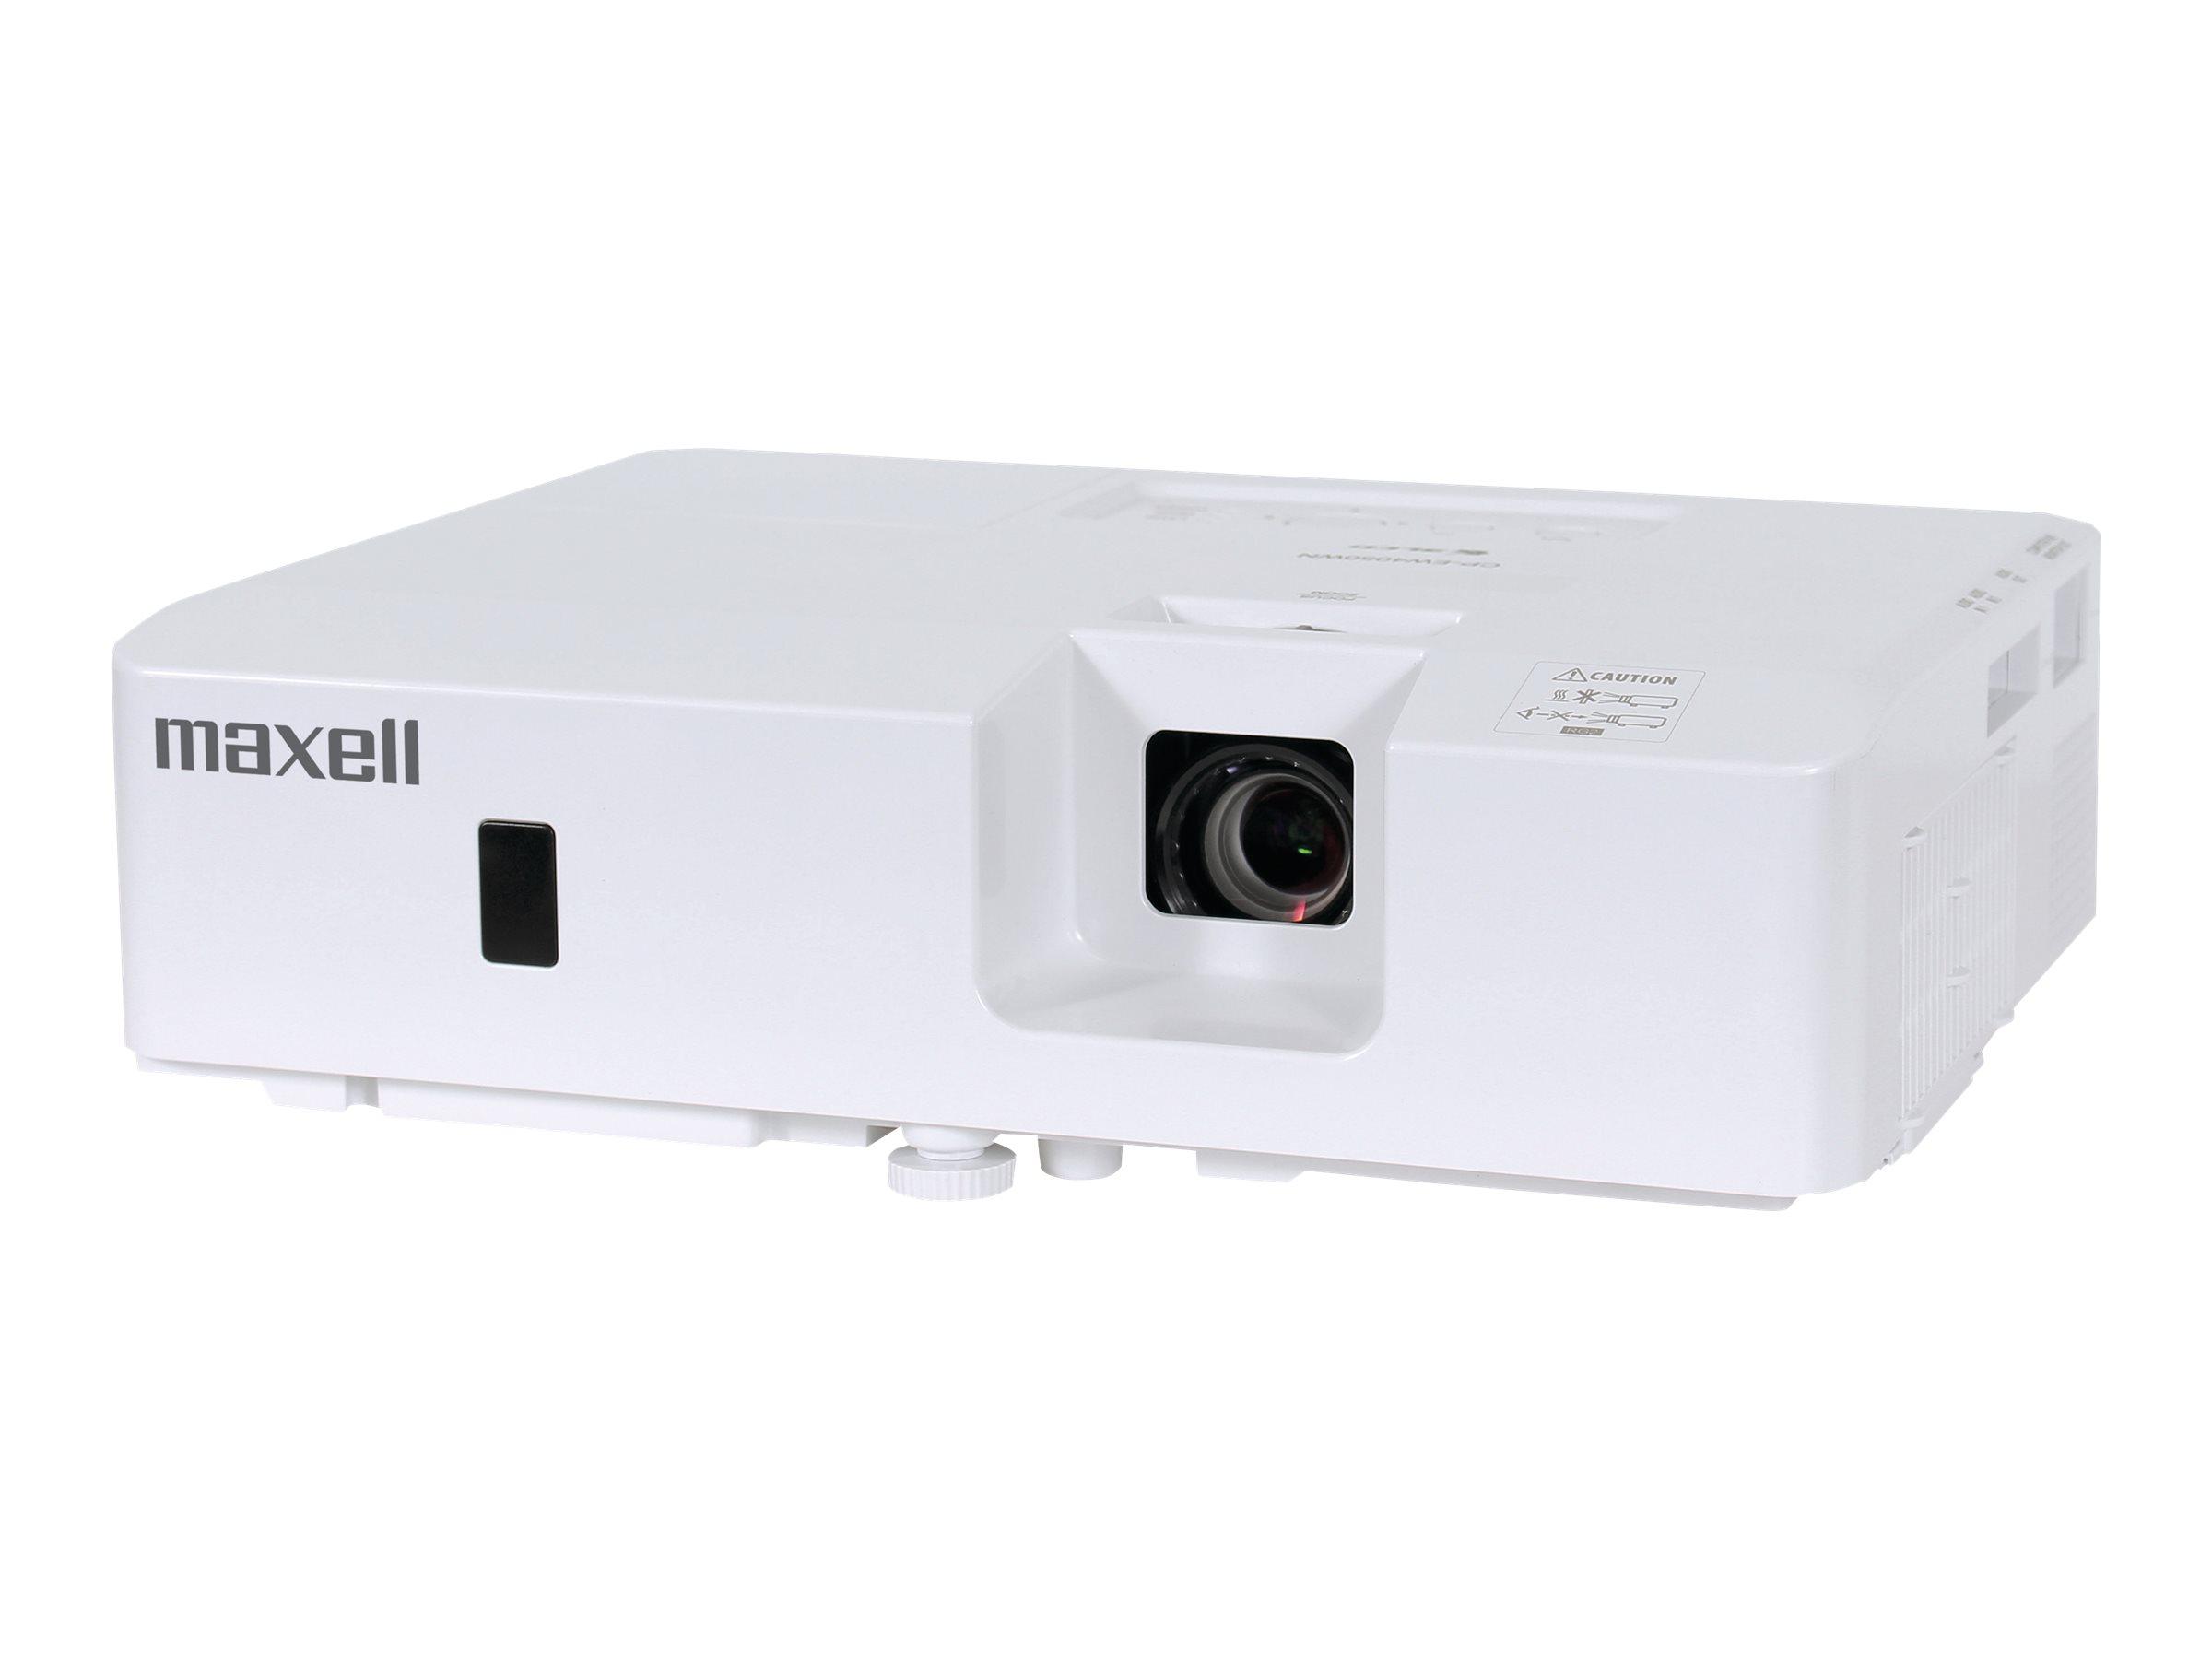 Maxell MC-EW4051 - 3LCD projector - LAN